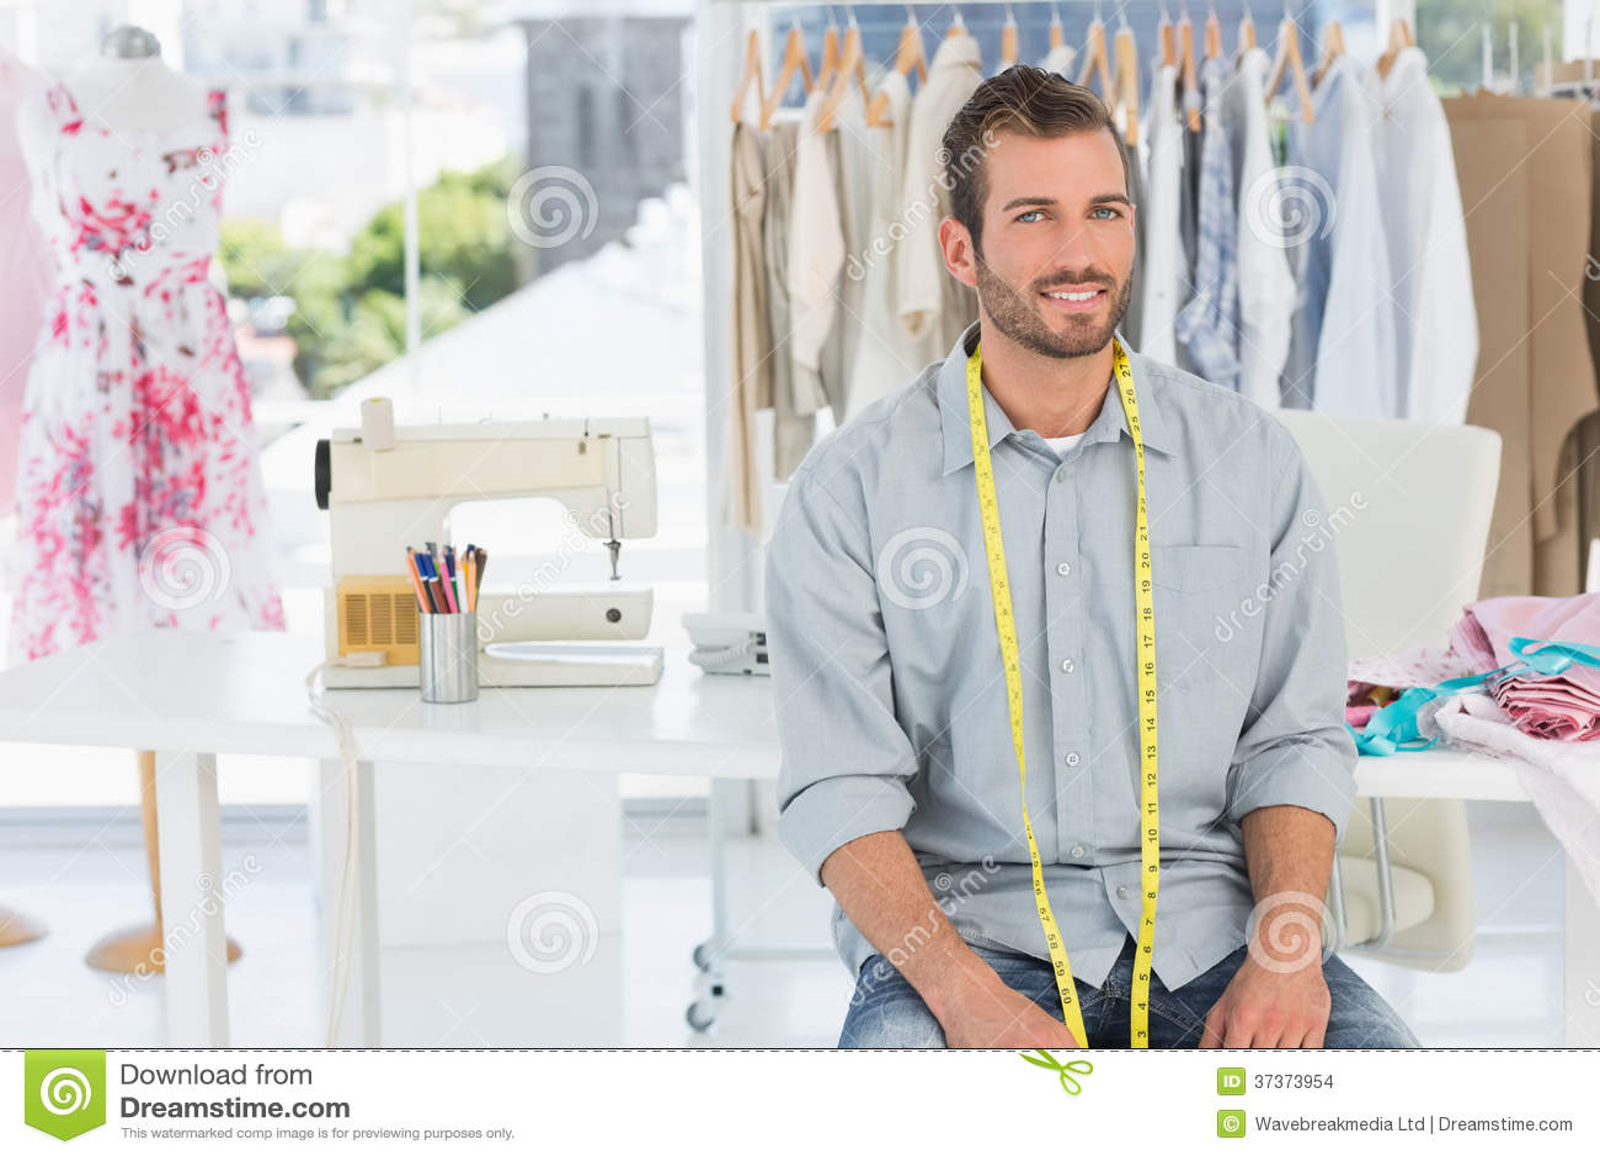 Handsome Male Fashion Designer In Studio Stock Images - Image ...